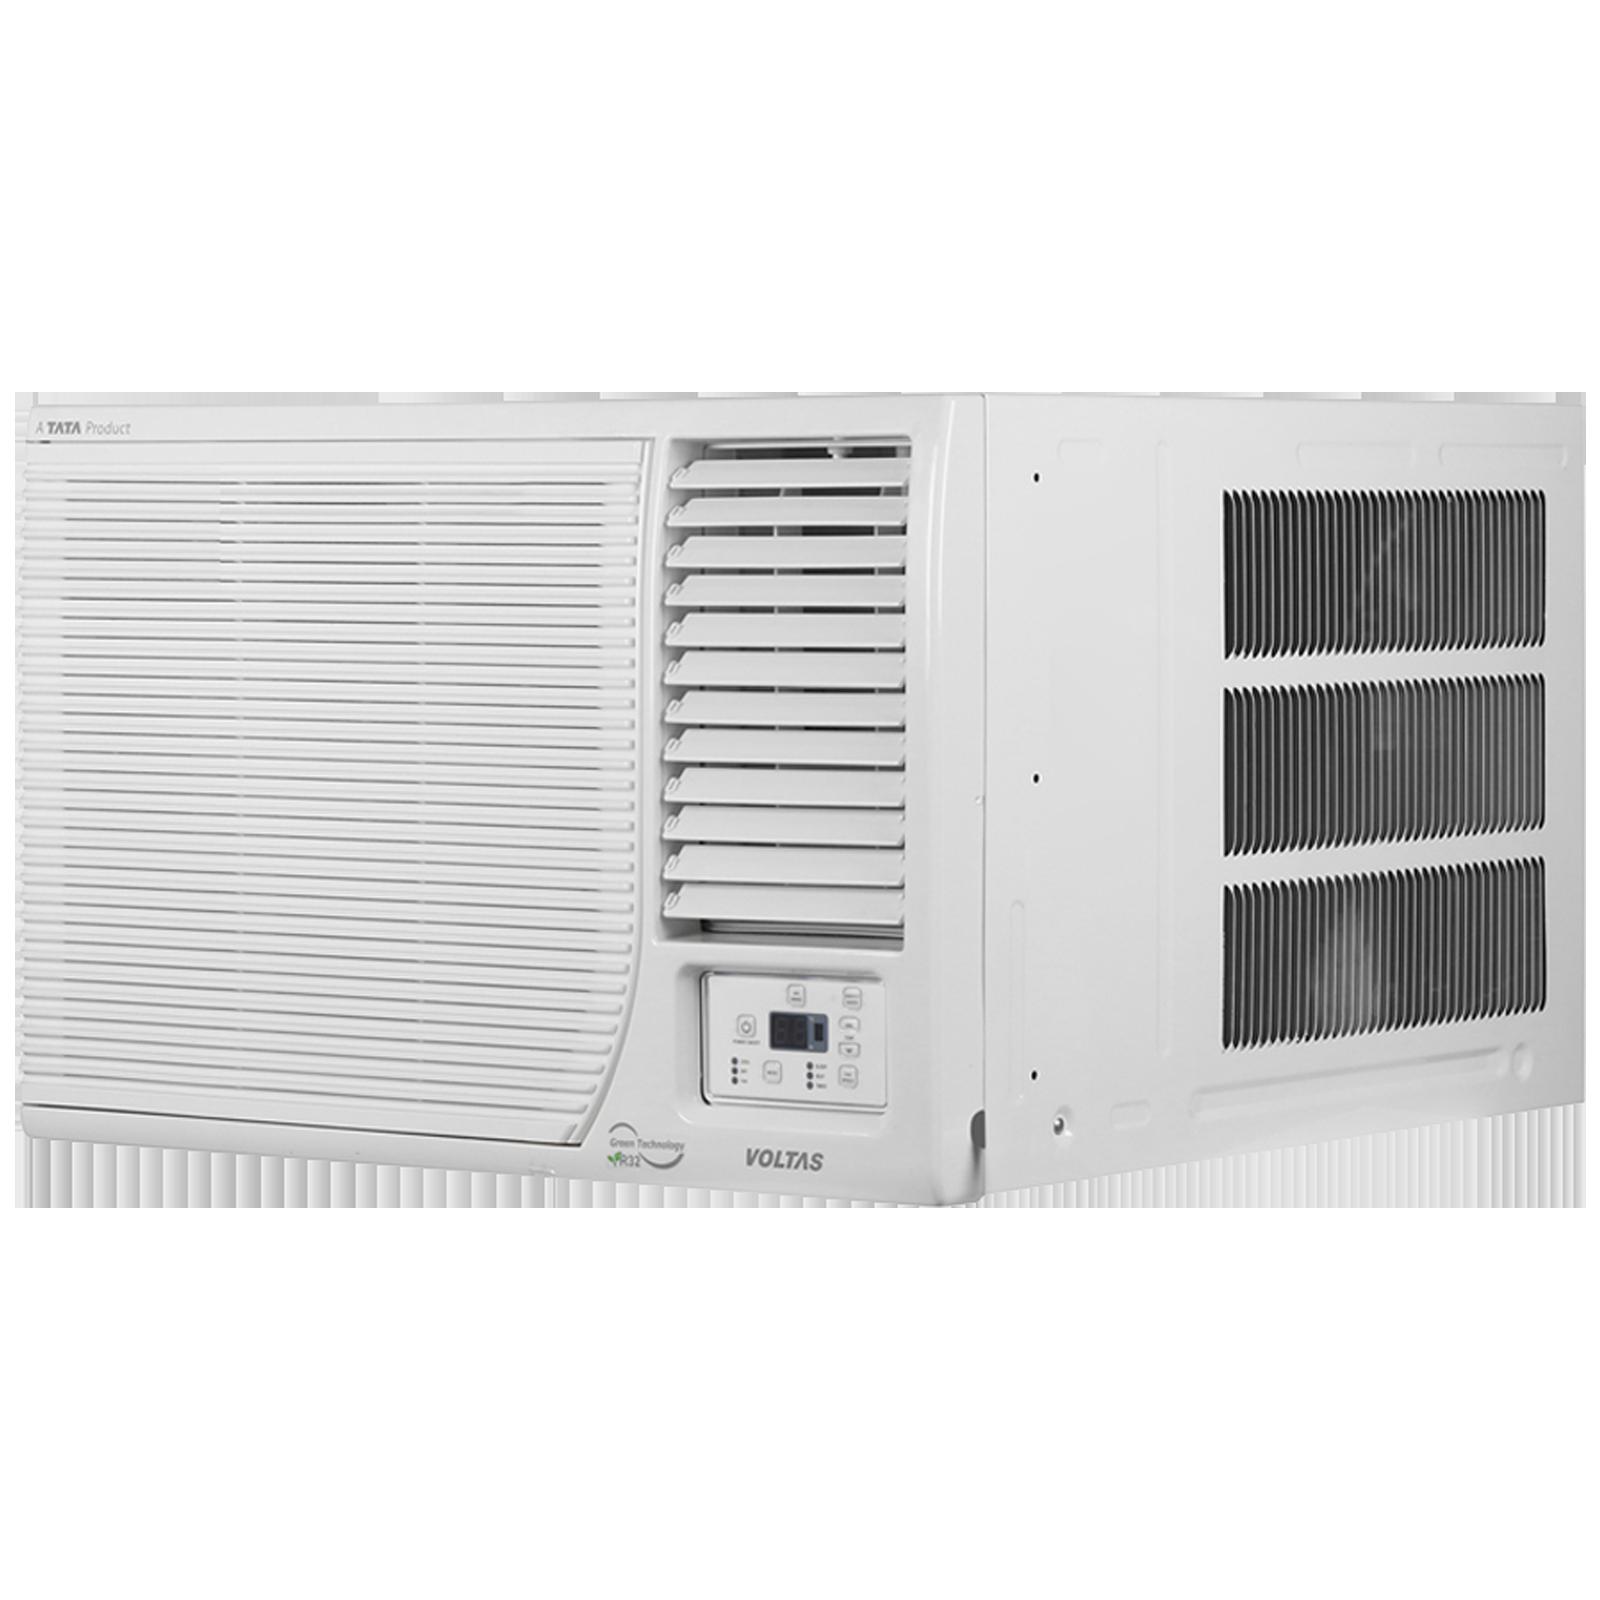 Voltas 1.5 Ton 3 Star Inverter Window AC (Hot and Cold, Copper Condenser, 18H DZB, White)_3